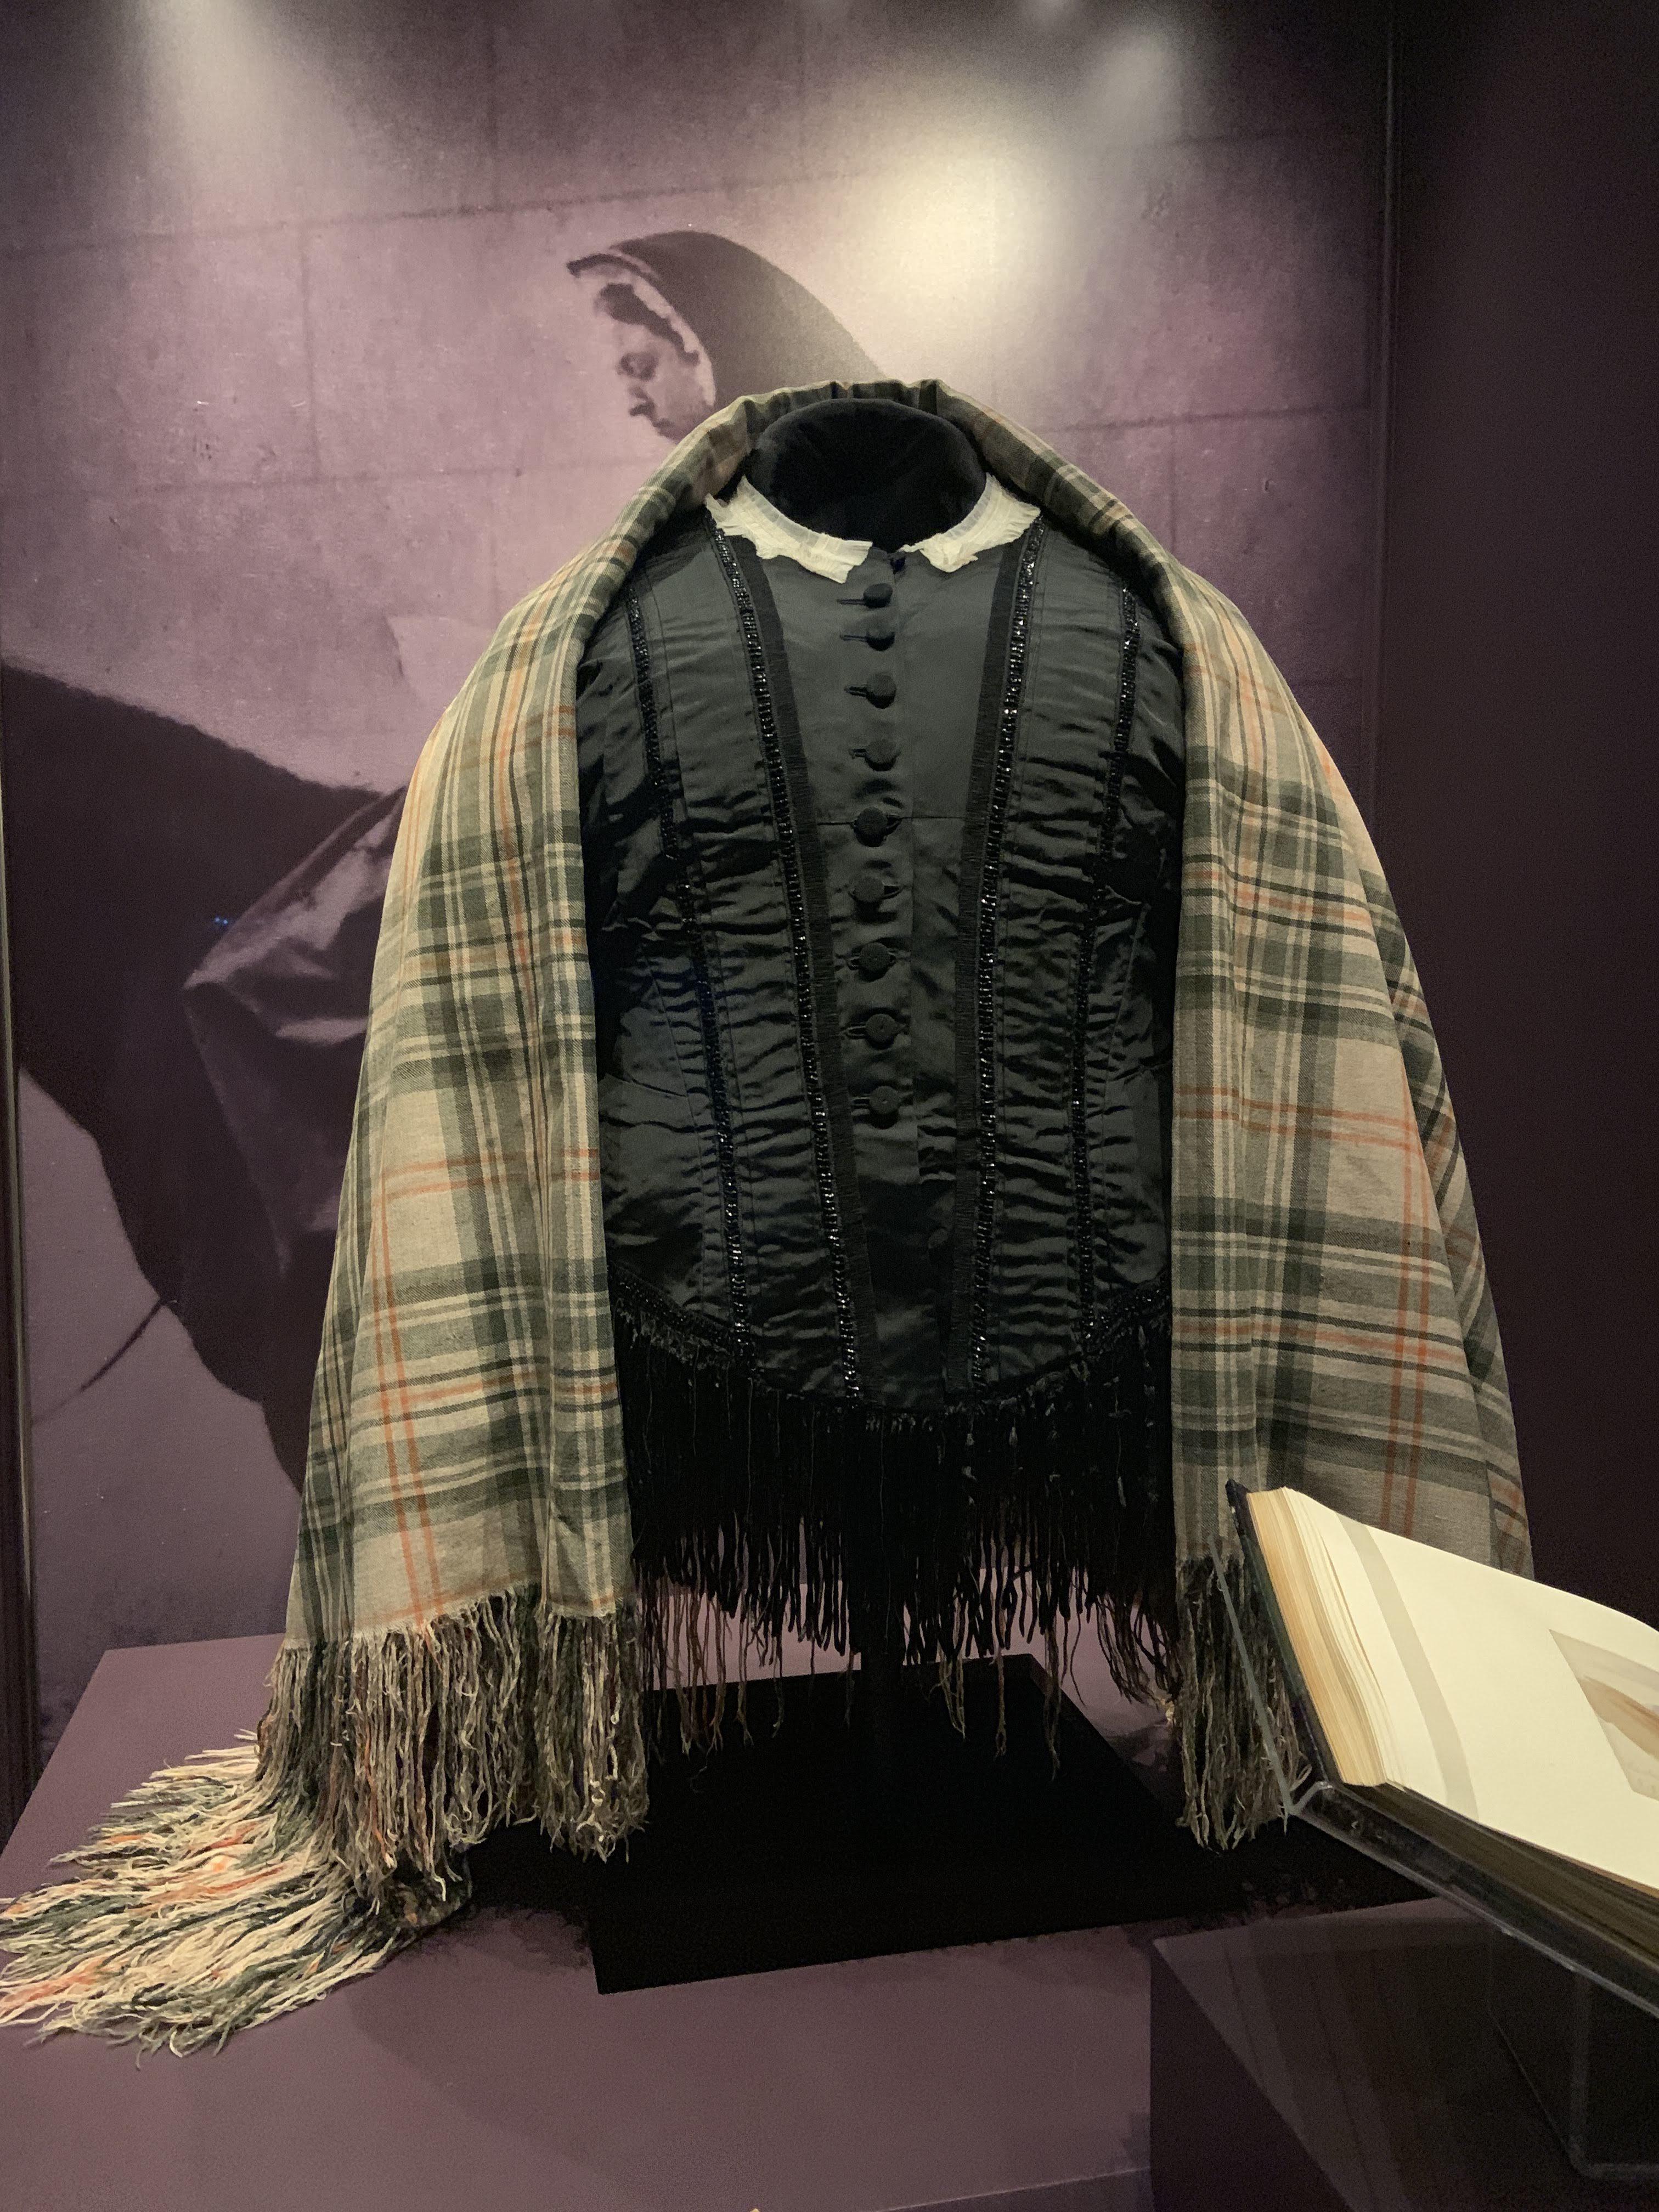 Queen Victoria's Balmoral Tartan Shawl